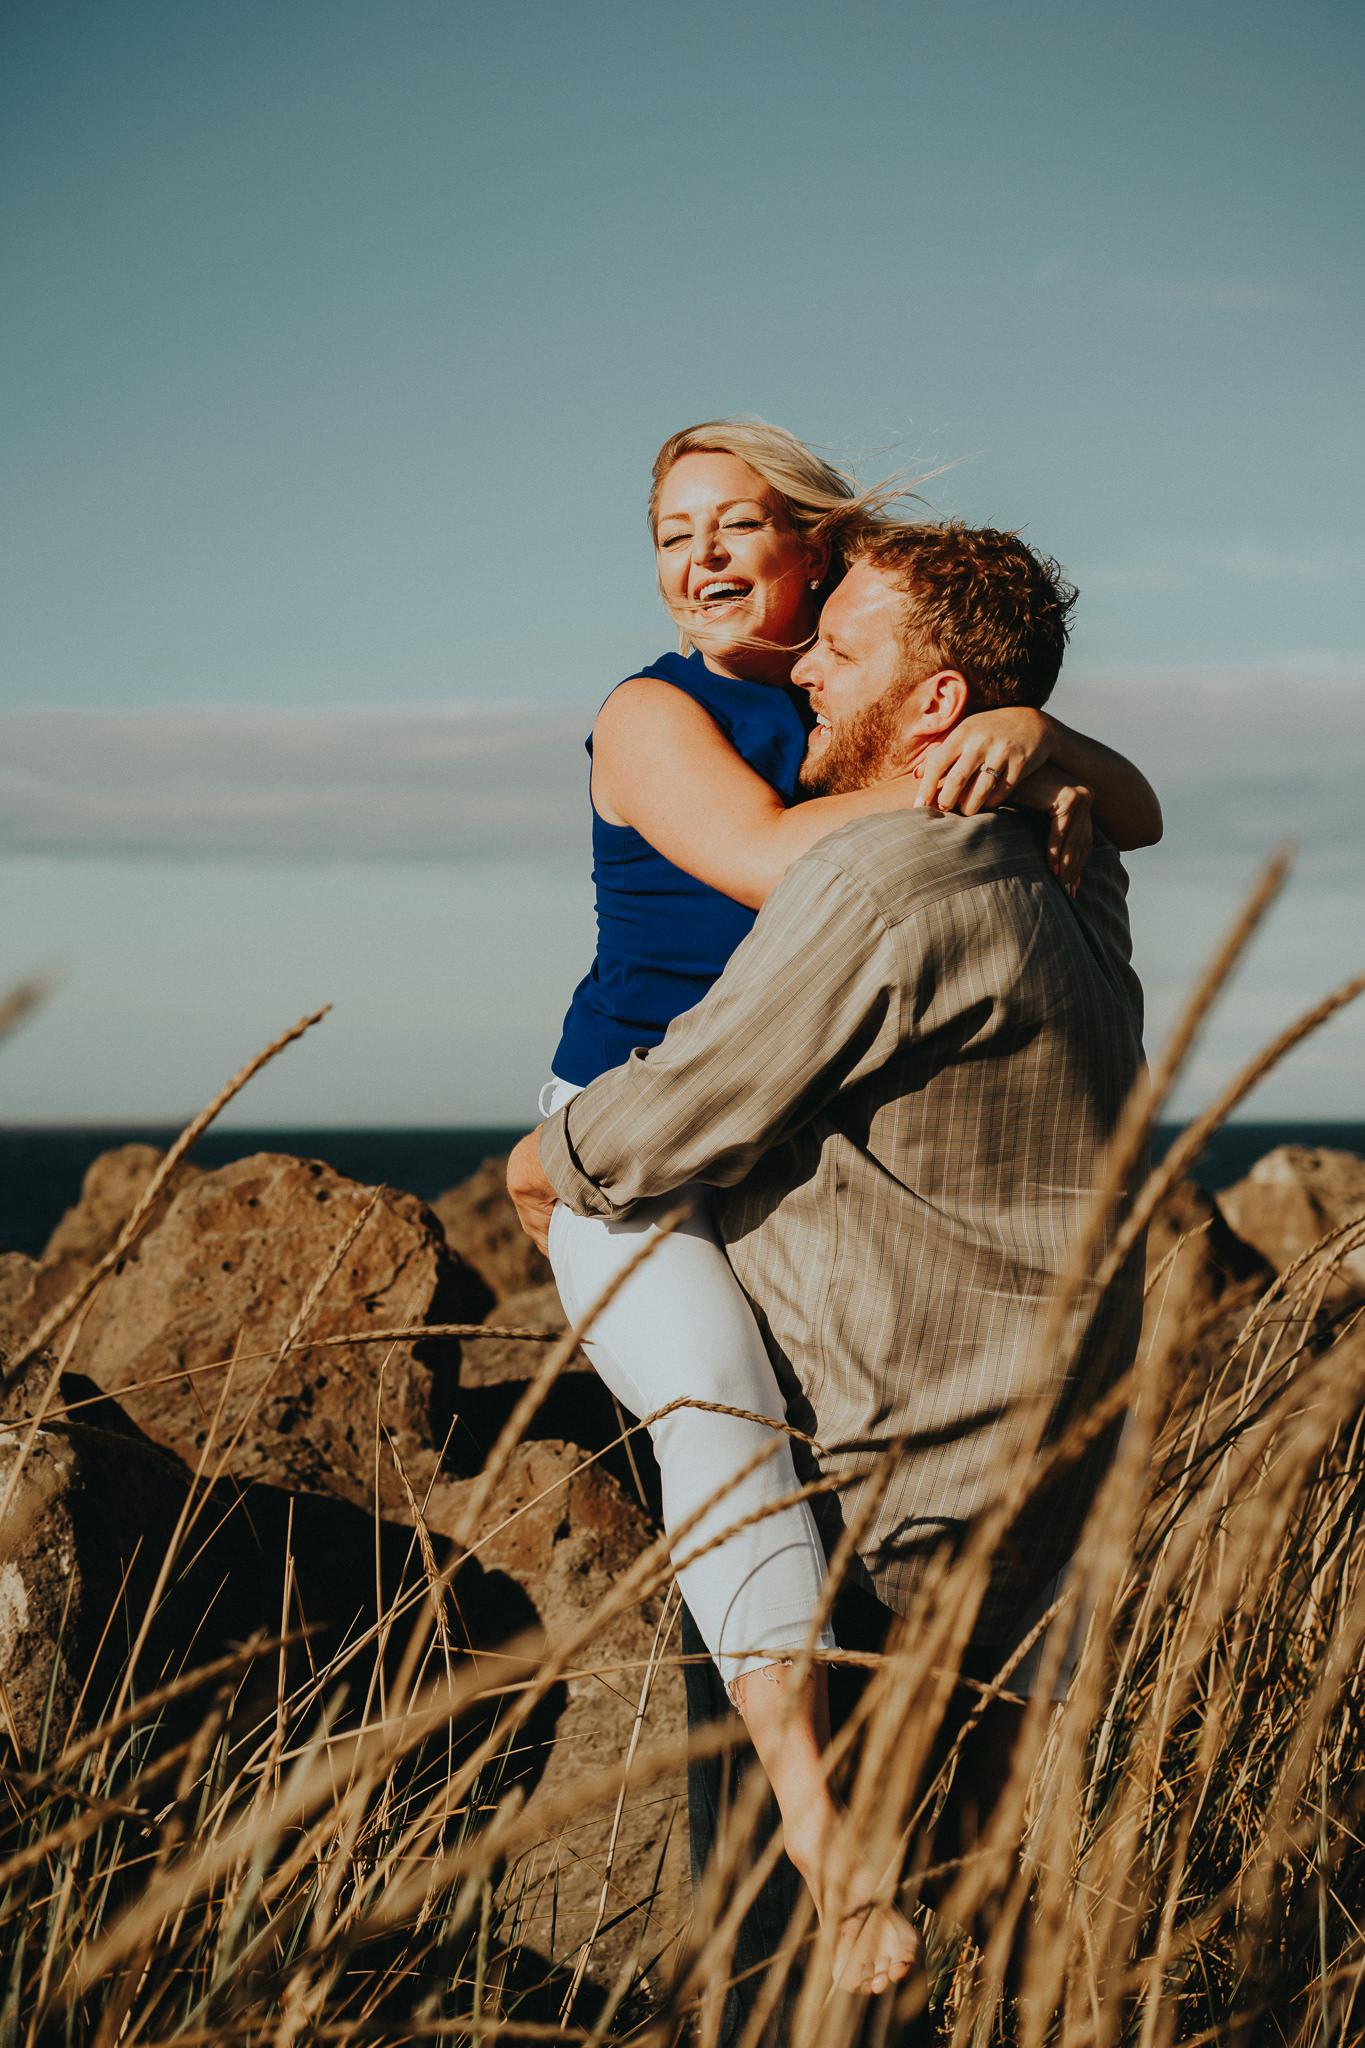 Harsh-Sun-Seattle-Engagement-photographer